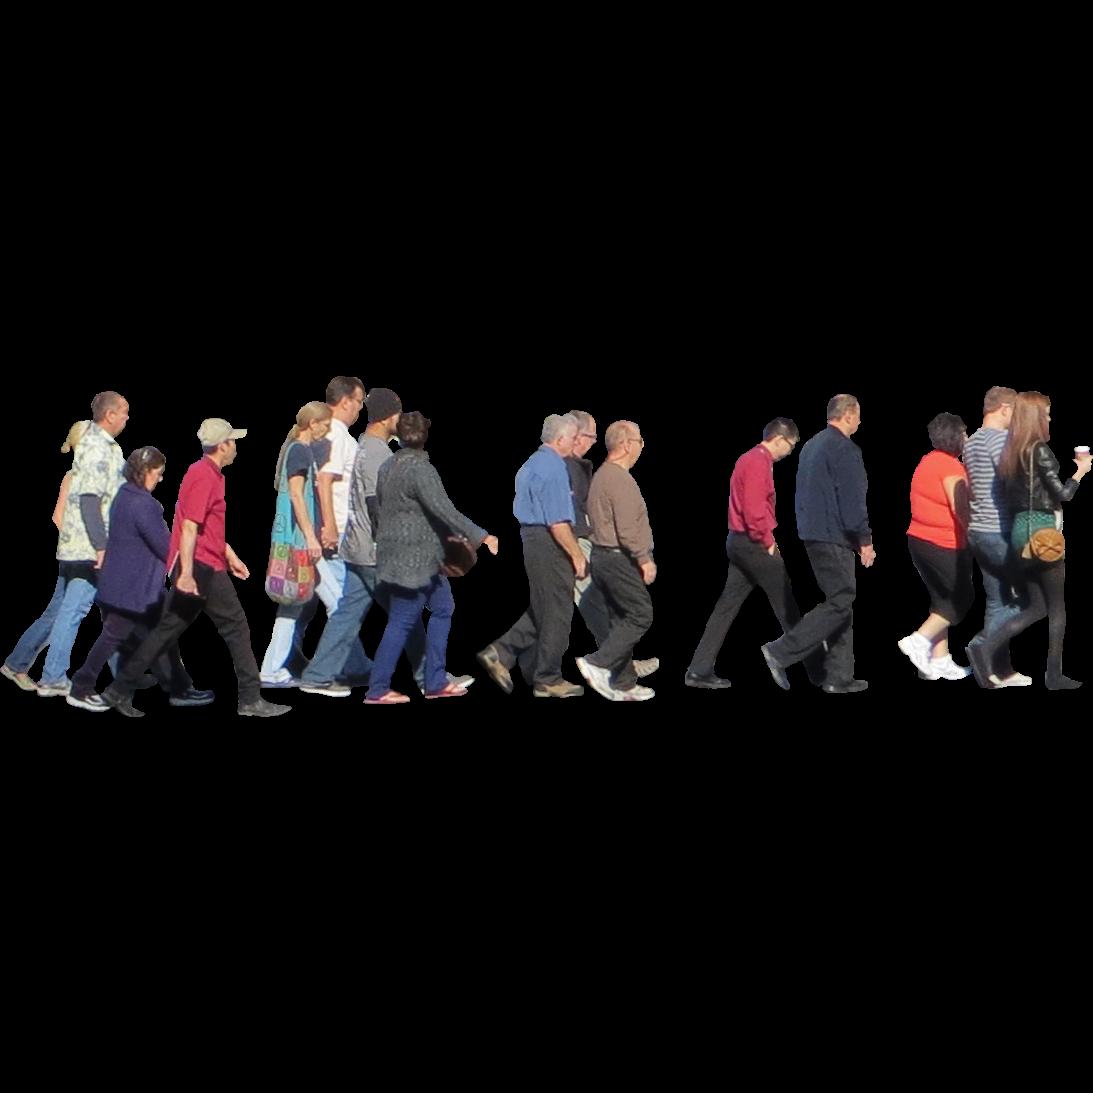 Crowd of People Walking Photoshop